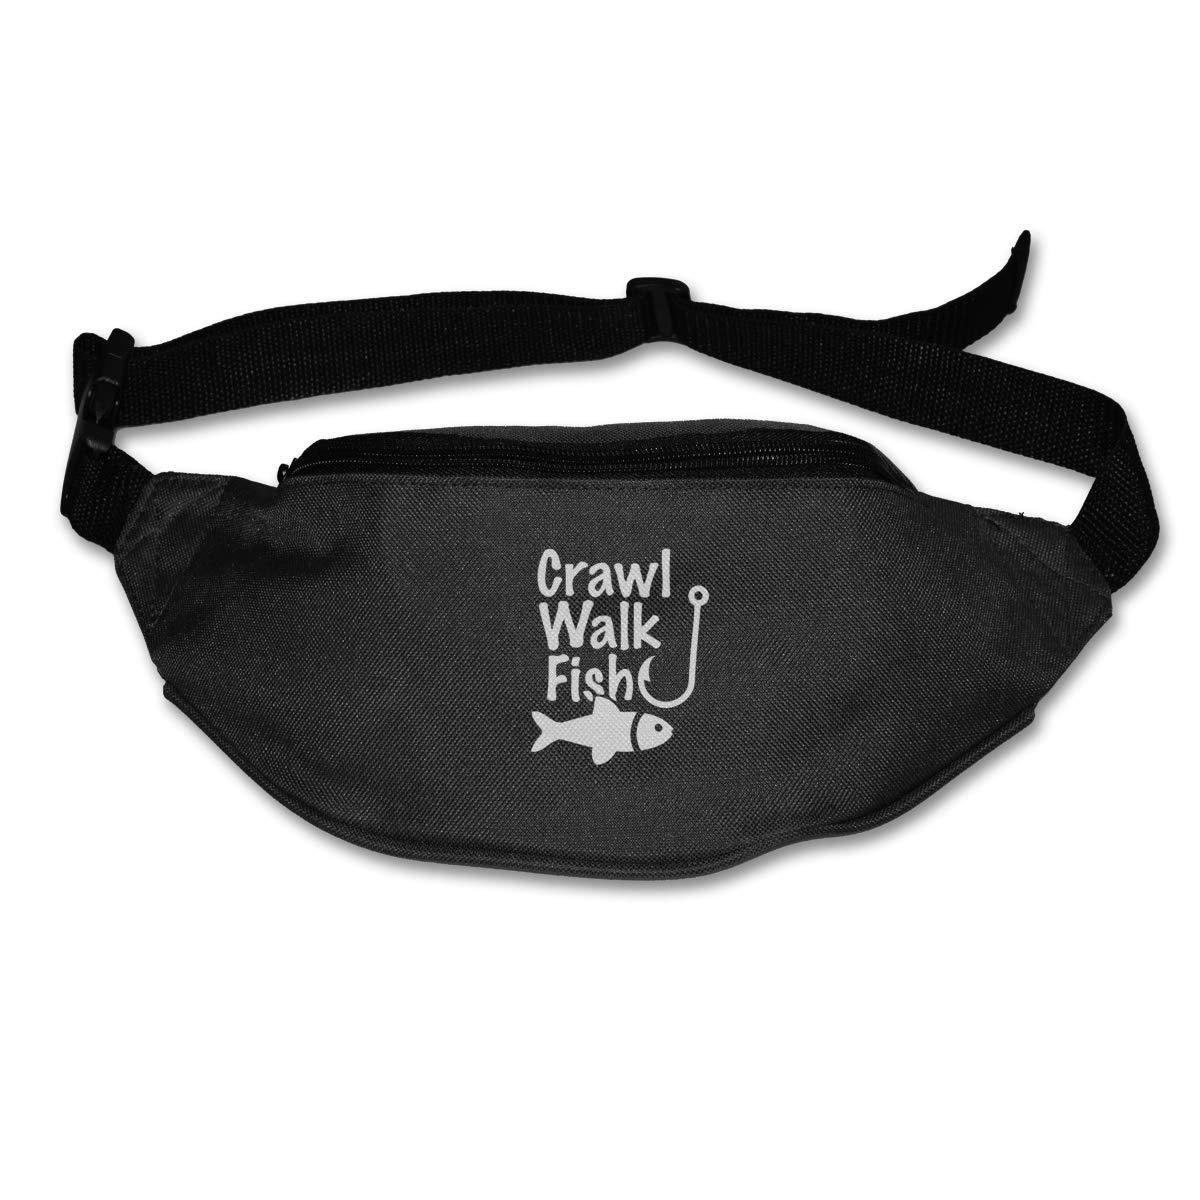 Crawl Walk Fish Sport Waist Packs Fanny Pack Adjustable For Travel